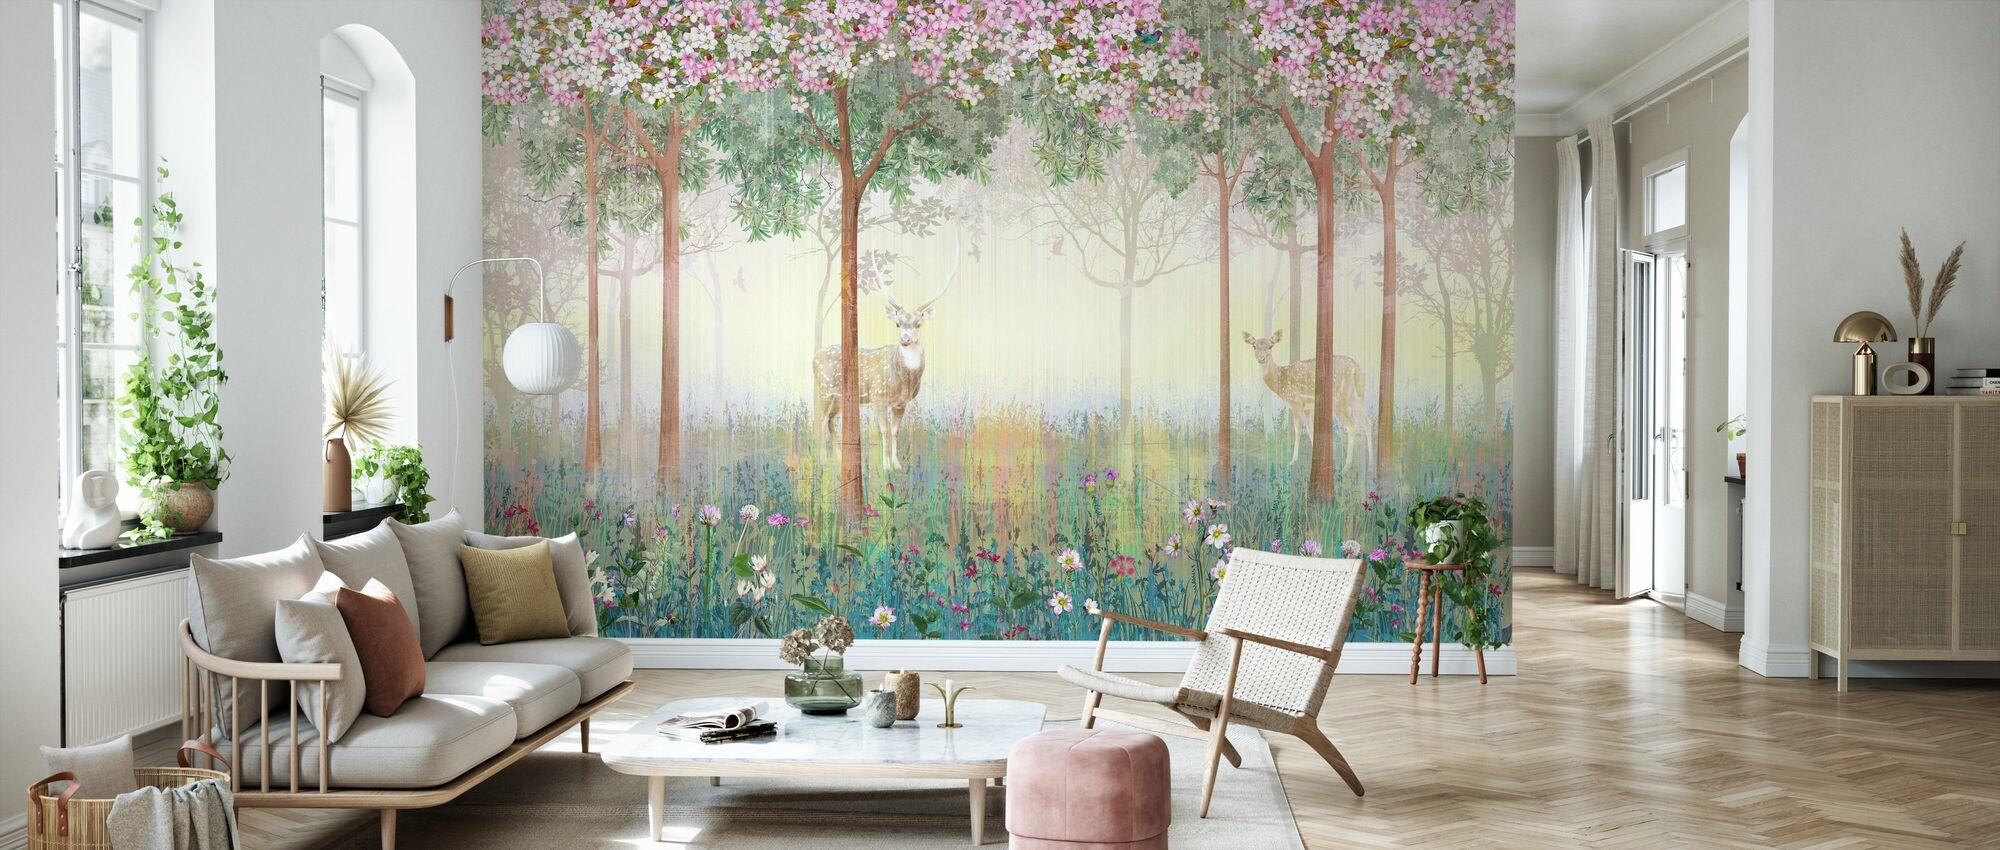 Deers in Dreamy Forest - Wallpaper - Living Room